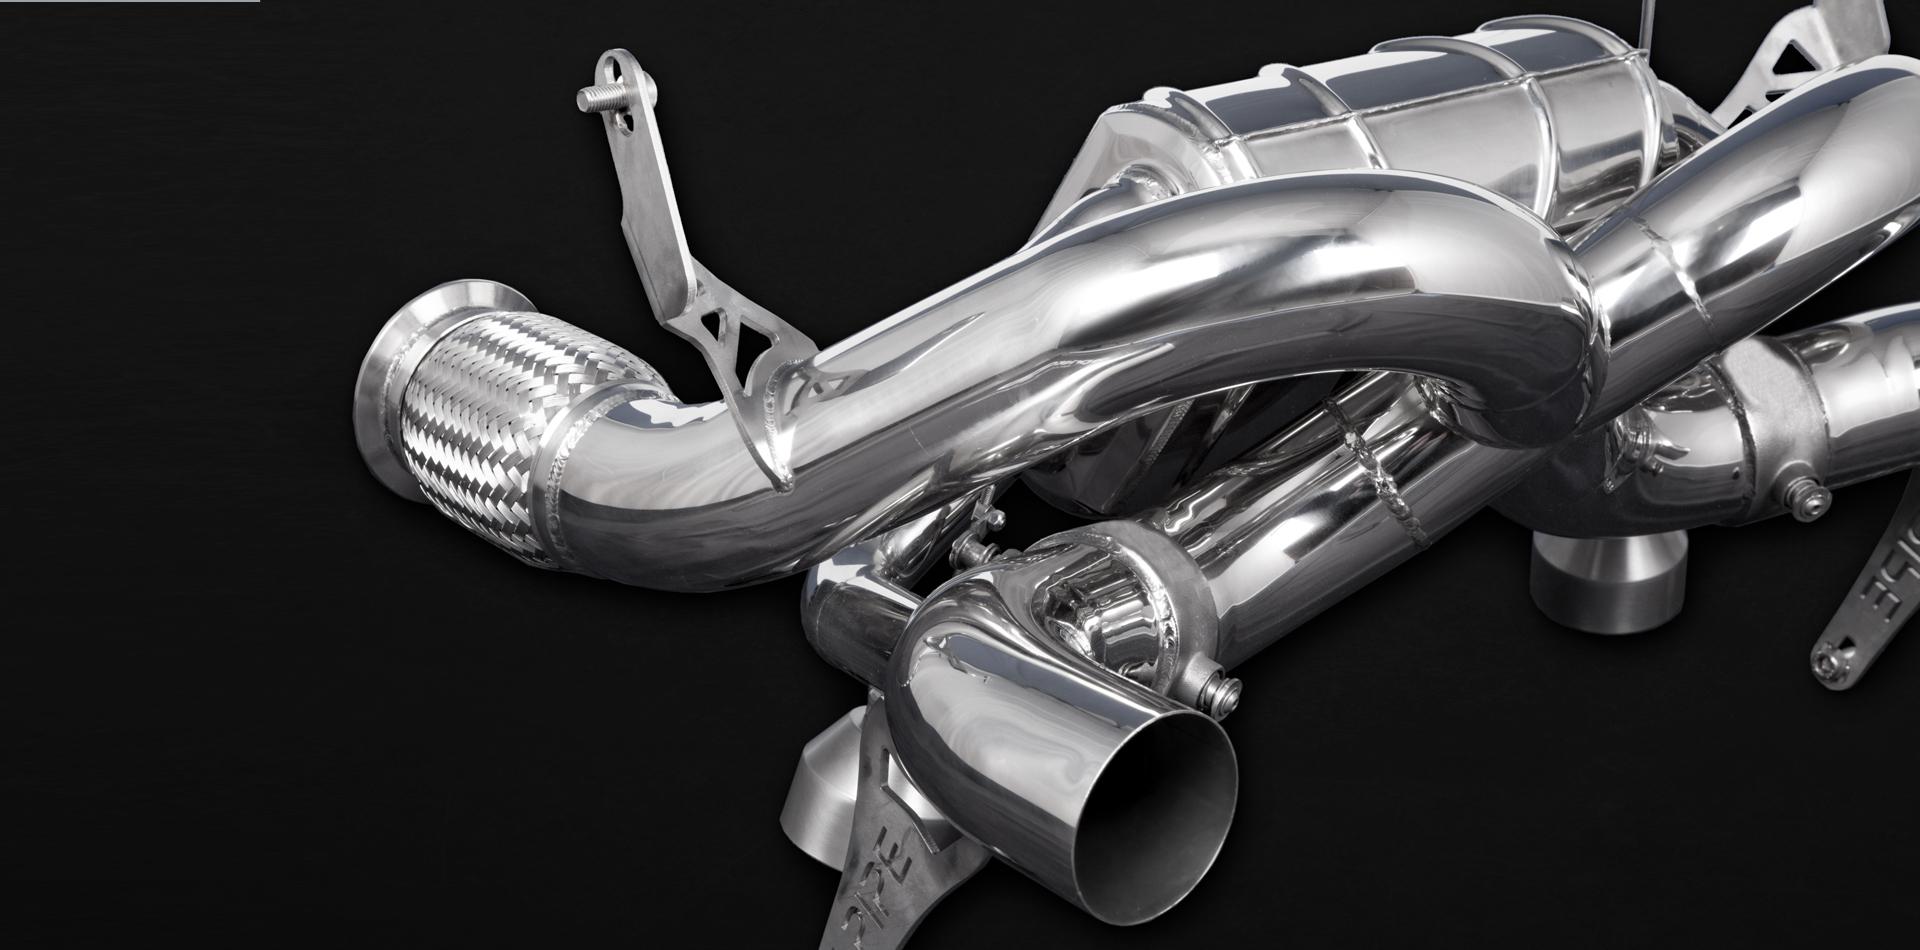 Lamborghini Huracan Performante Auspuffanlage mit Klappensteuerung